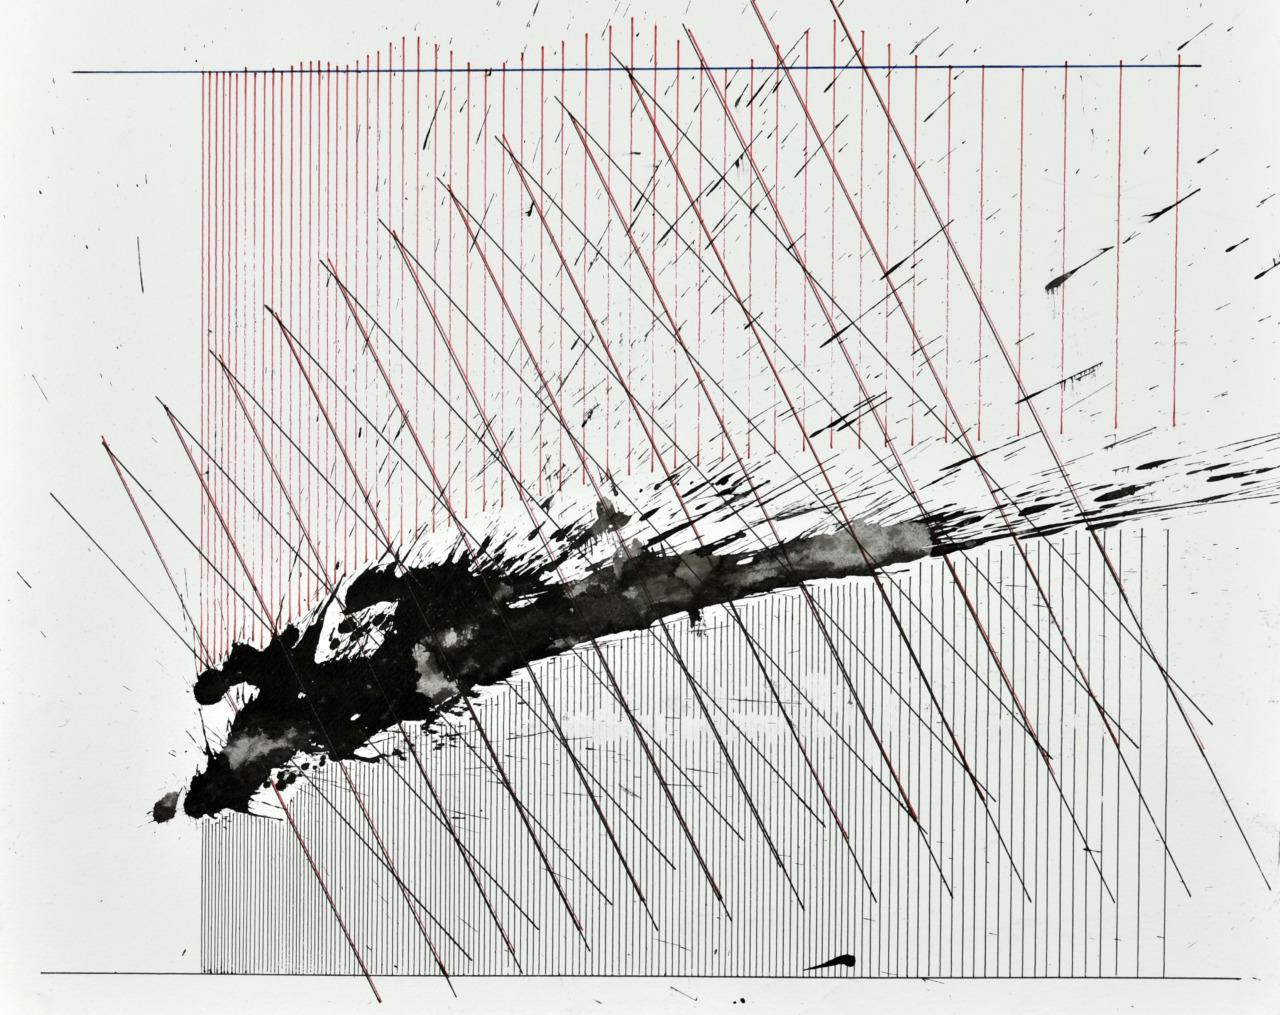 op130520. acrylic on paper, 40x50cm